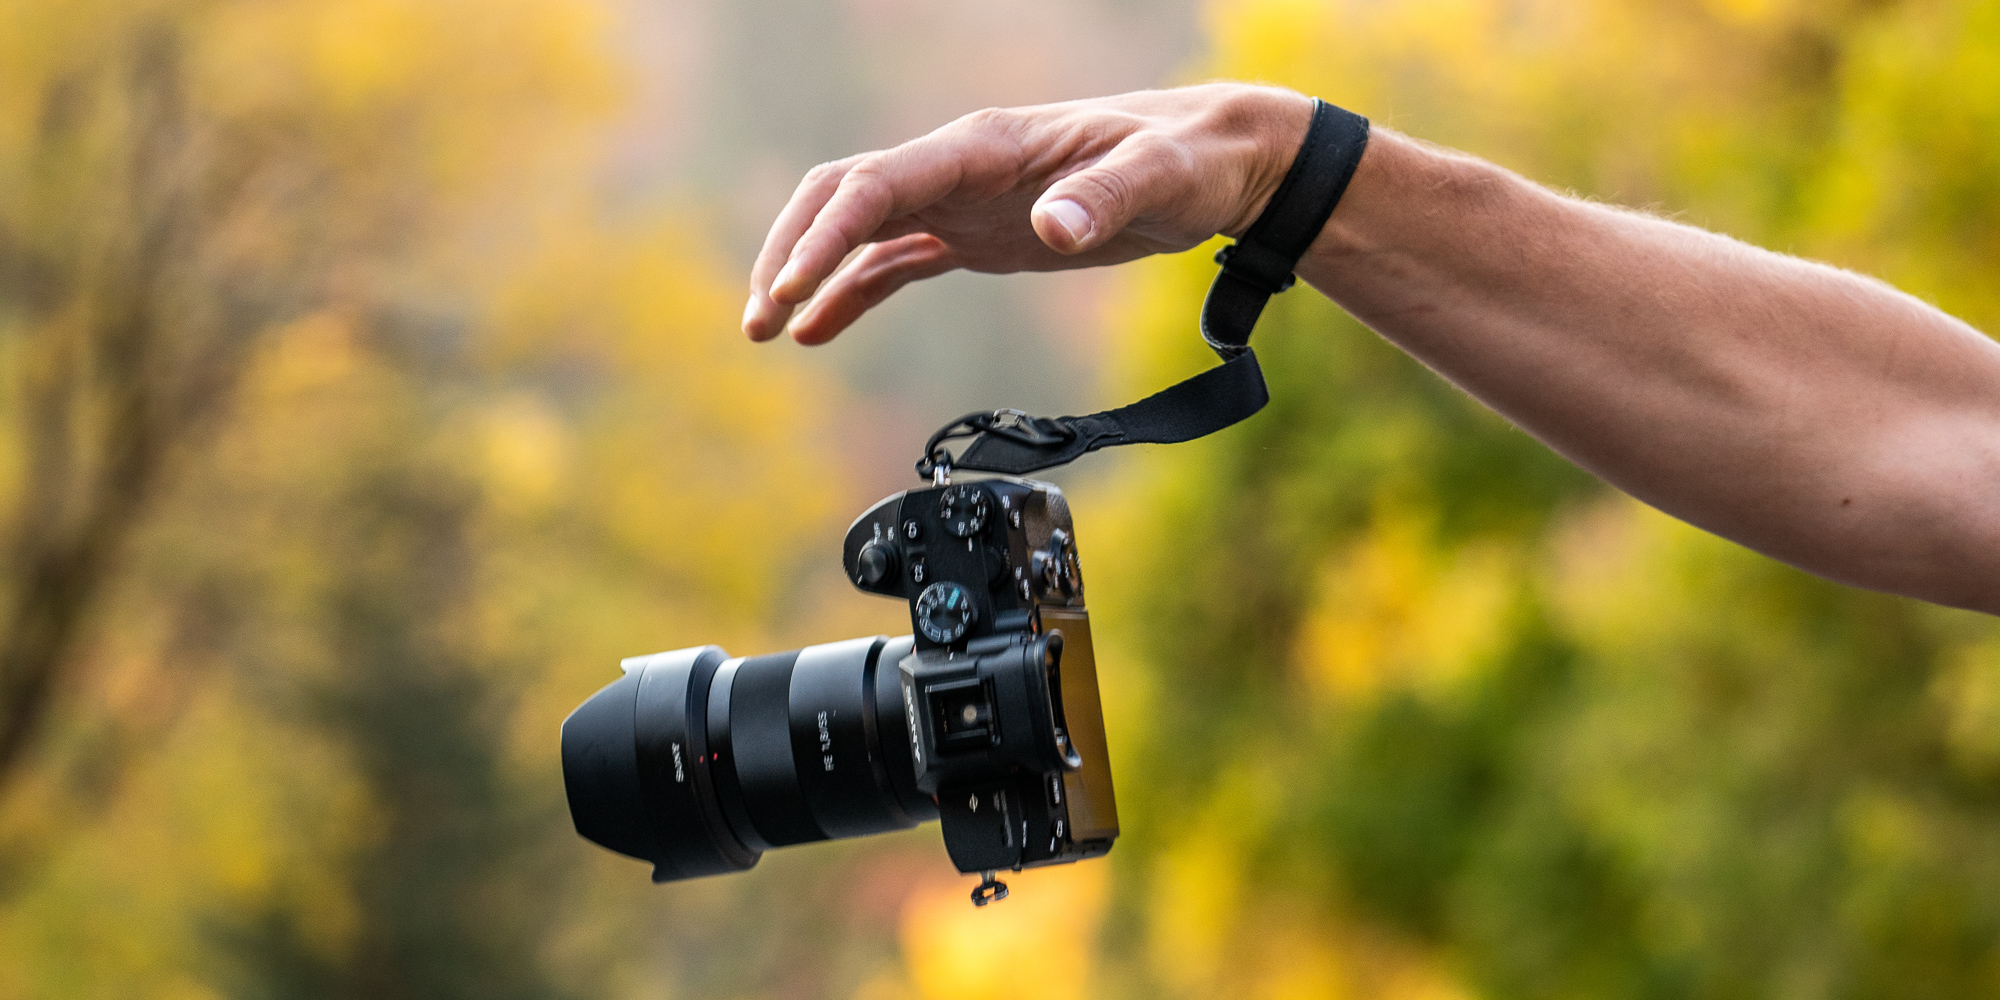 Wandrd Wrist Strap - an always safe camera